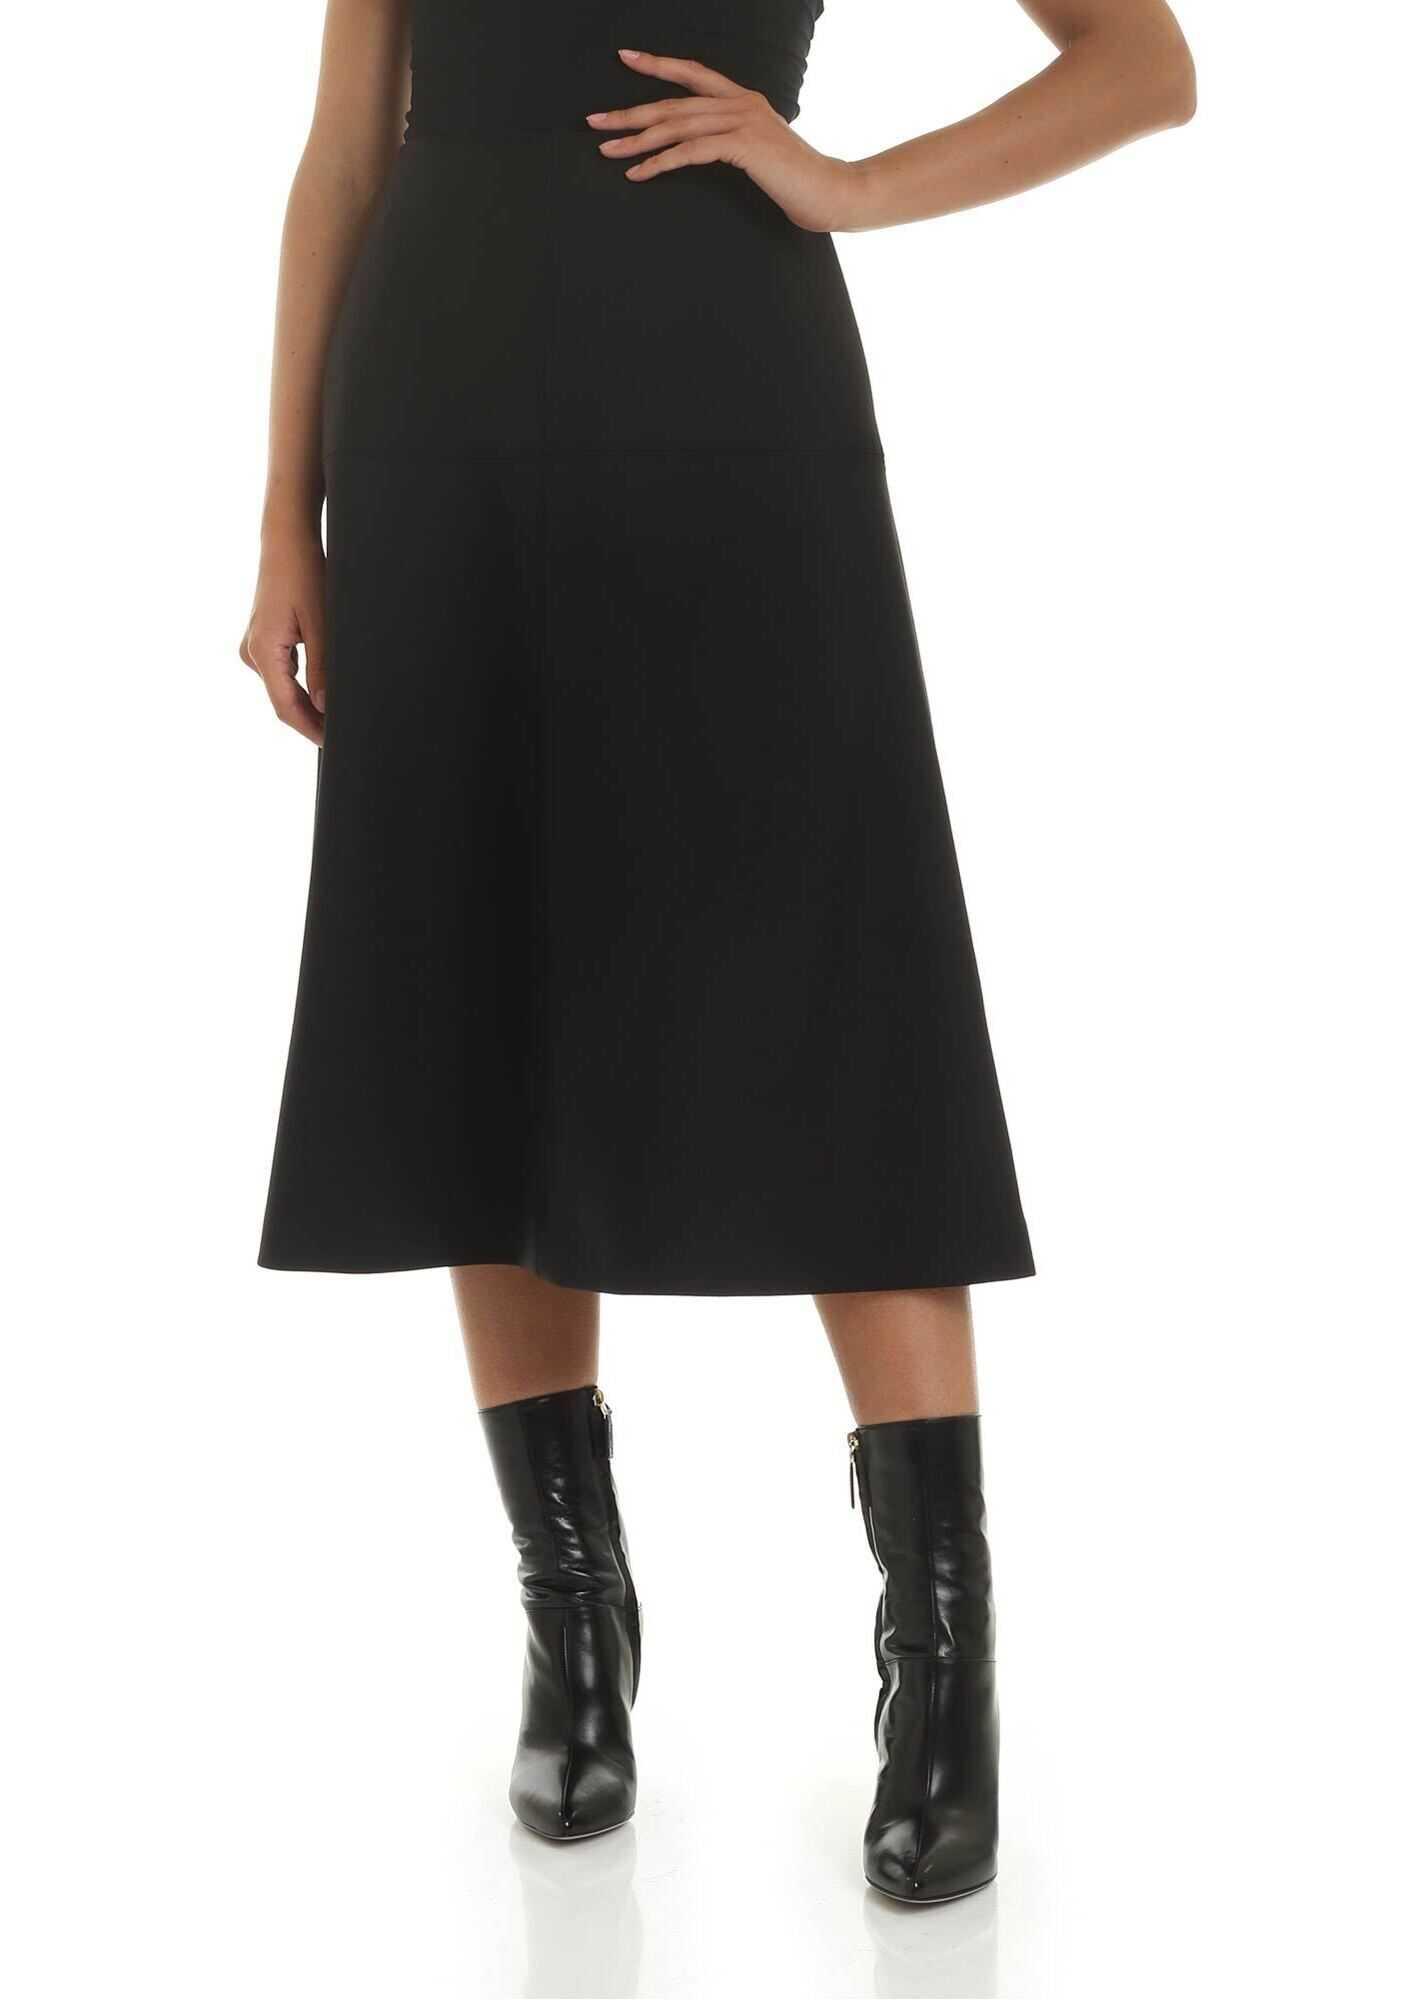 adidas by Stella McCartney Black Flared Midi Skirt Black